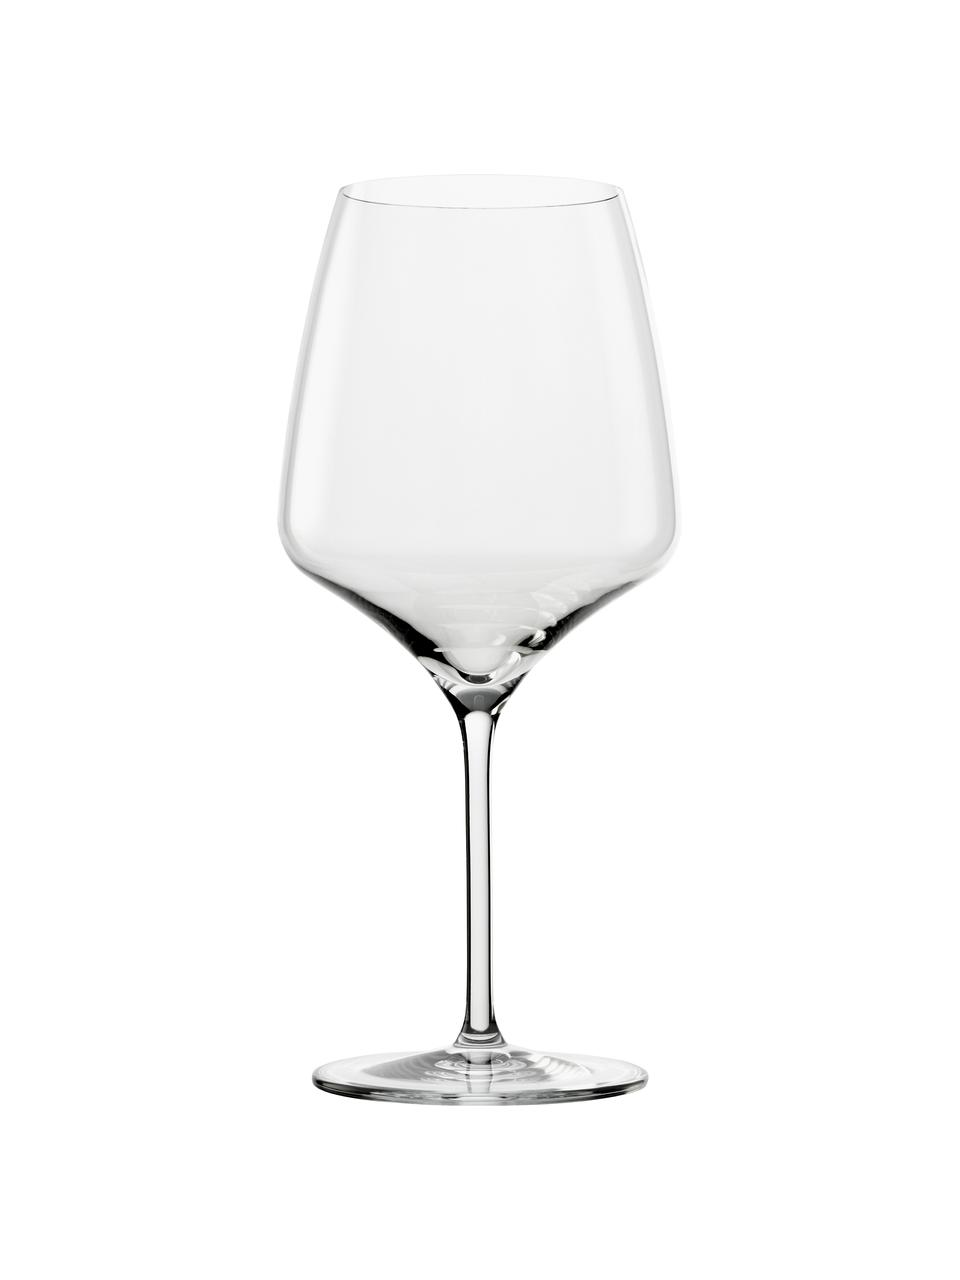 Kristall-Rotweingläser Experience, 6 Stück, Kristallglas, Transparent, Ø 11 x H 23 cm